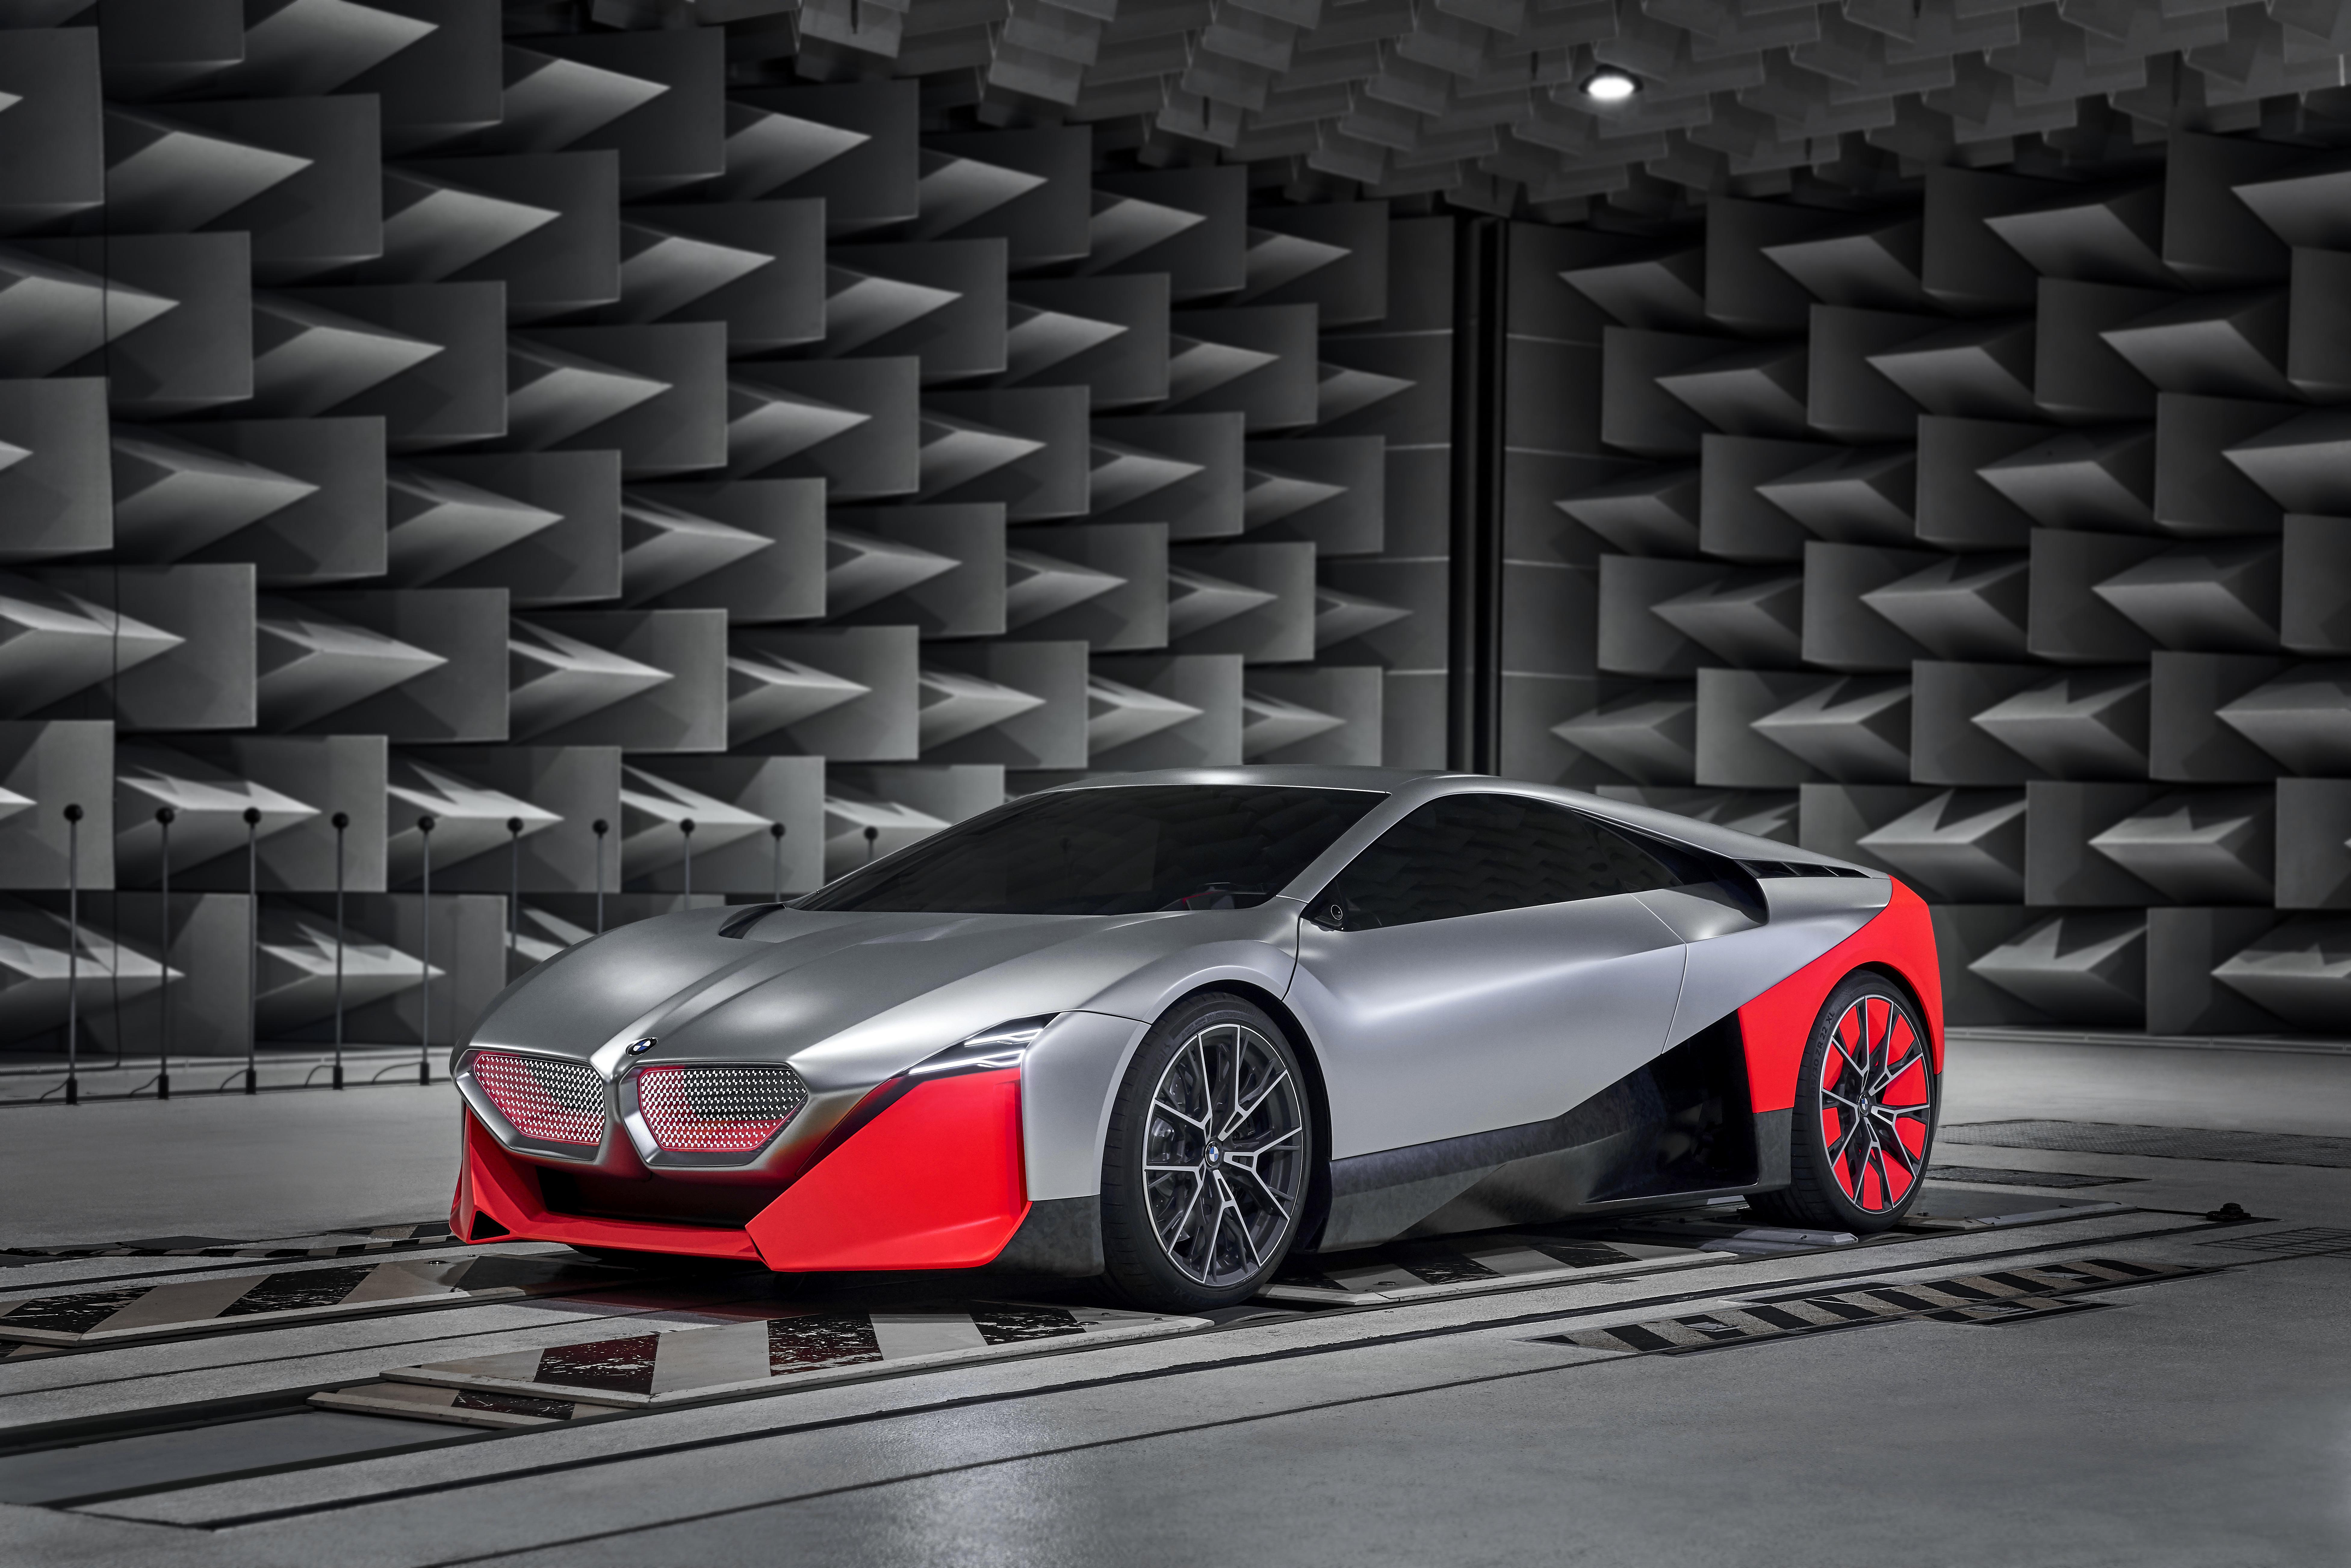 bmw vision m next 2019 1577652470 - BMW Vision M NEXT 2019 - BMW Vision M NEXT 4k wallpaper